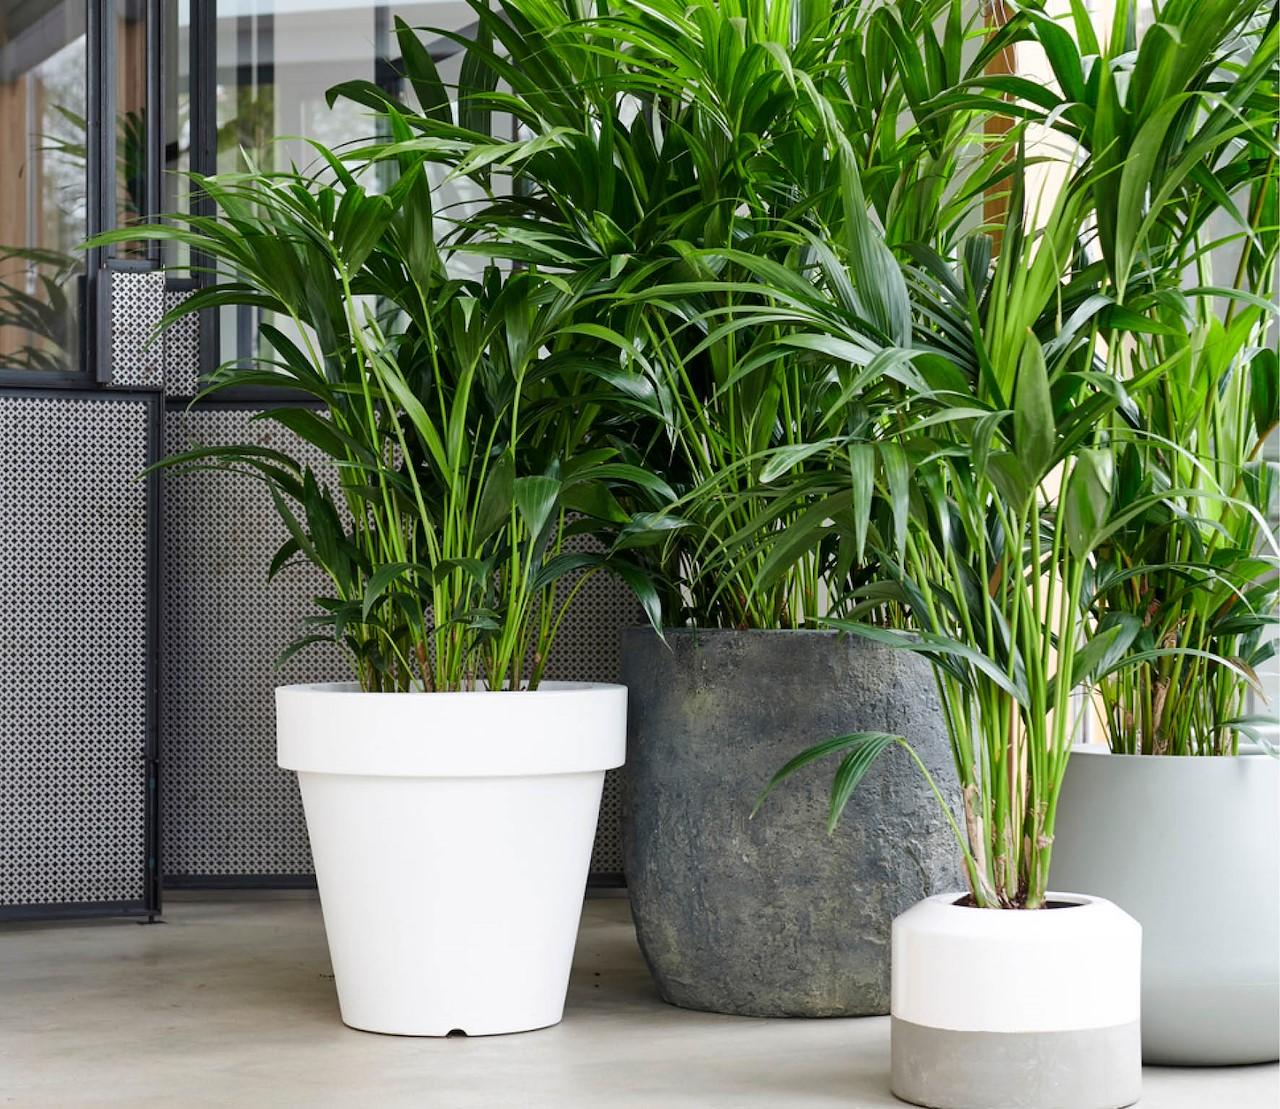 Kentiapalmen, groene charmeurs in huis